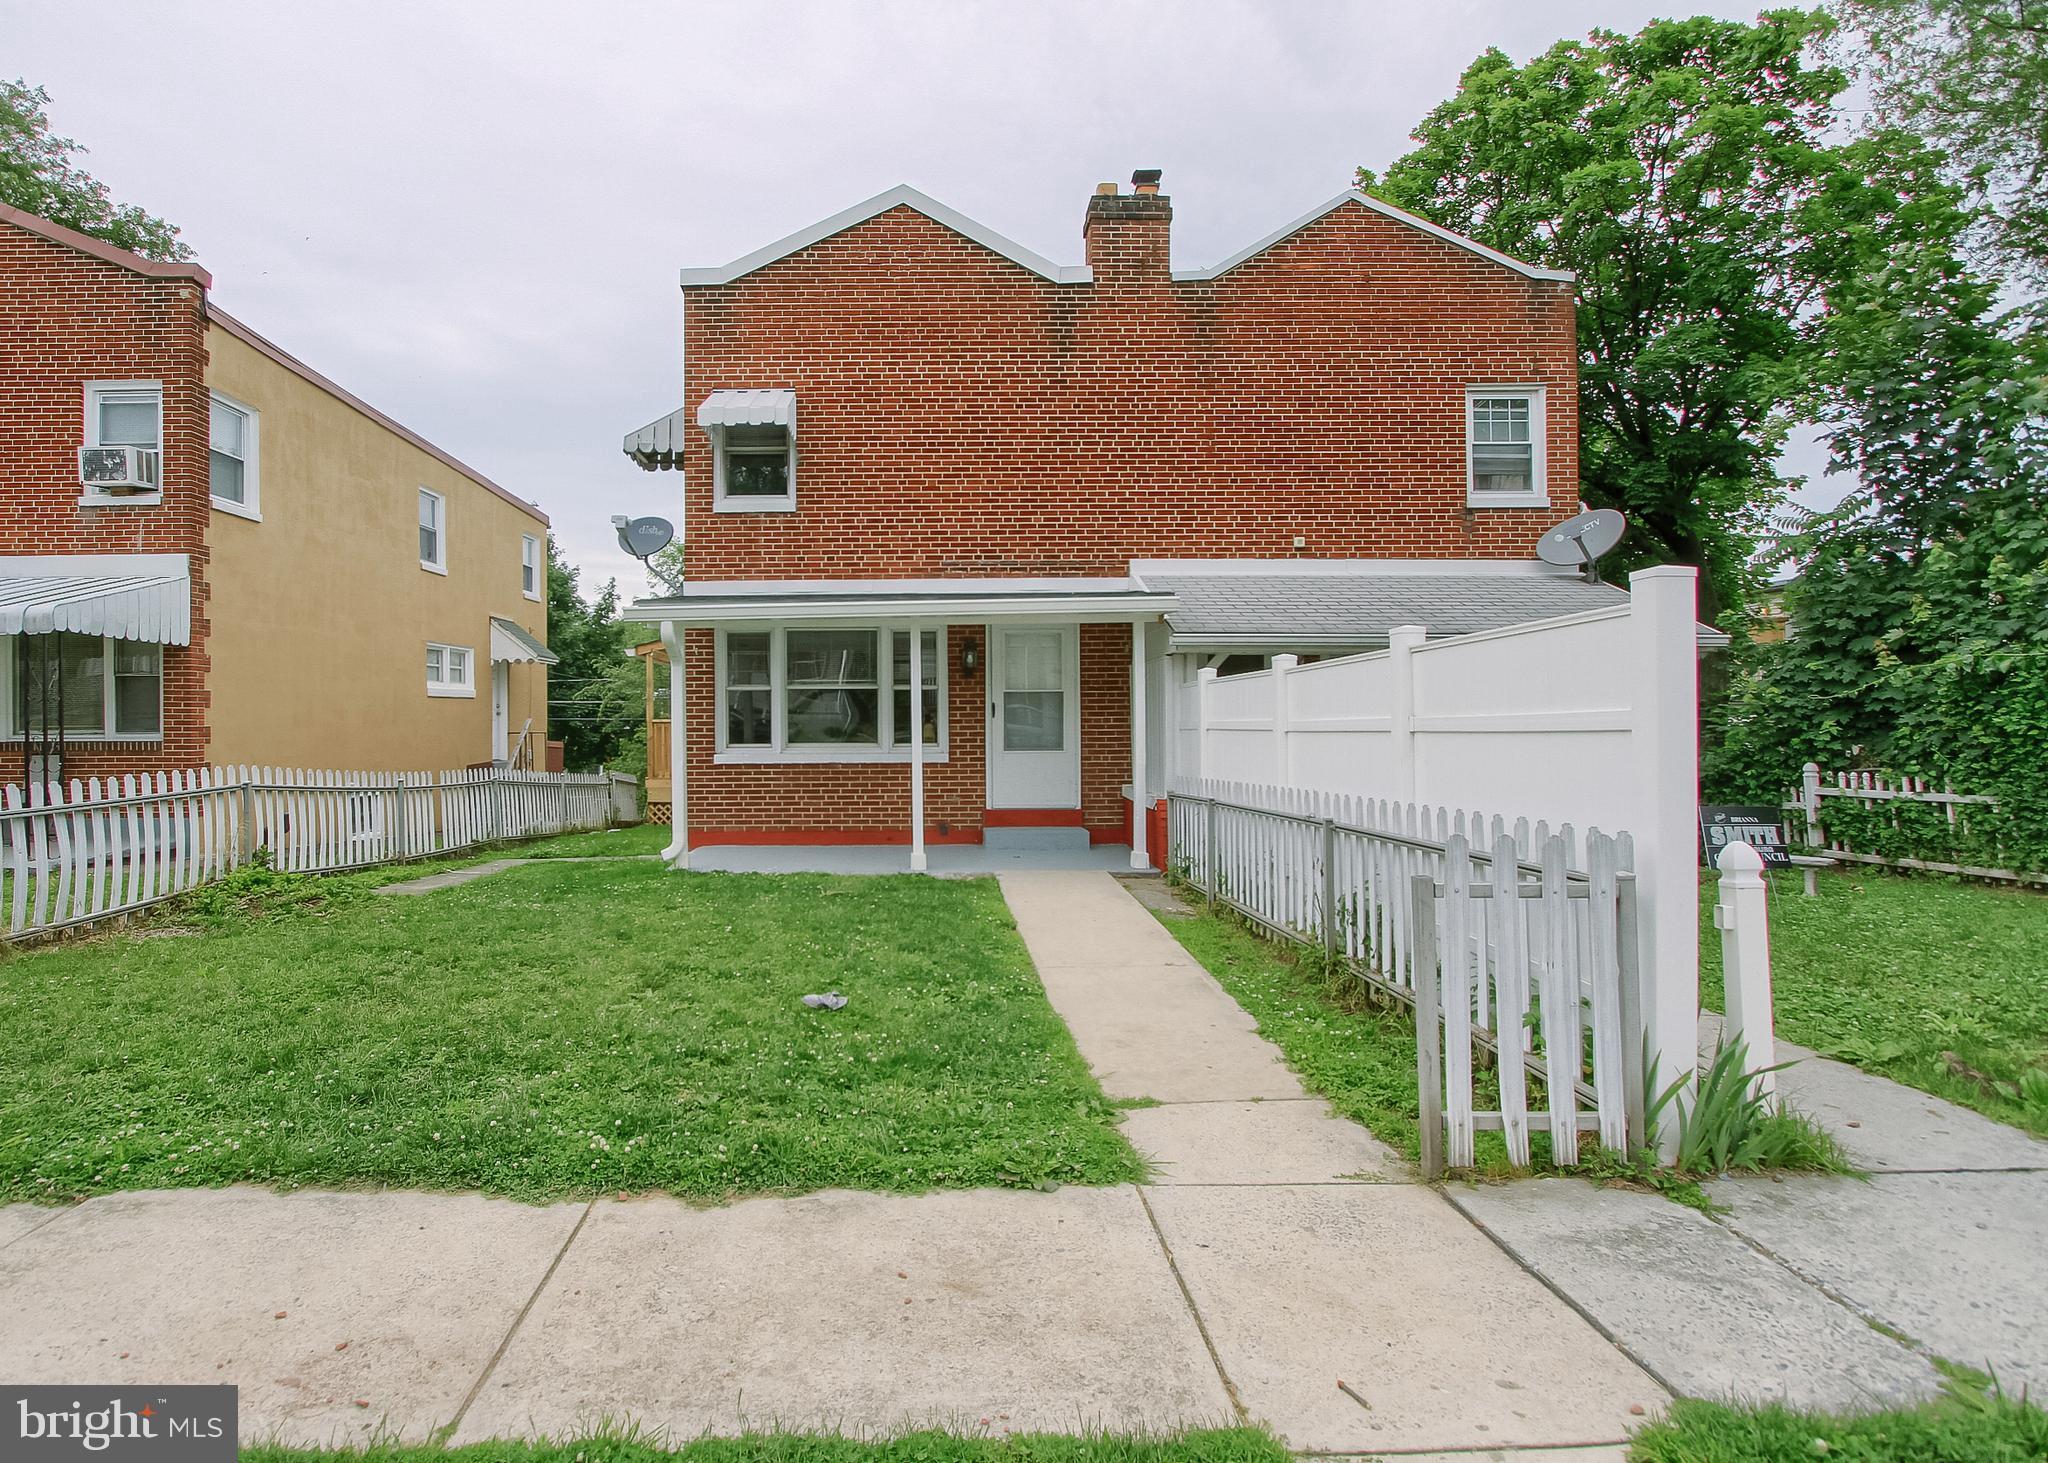 1836 BRIGGS STREET, HARRISBURG, PA 17103